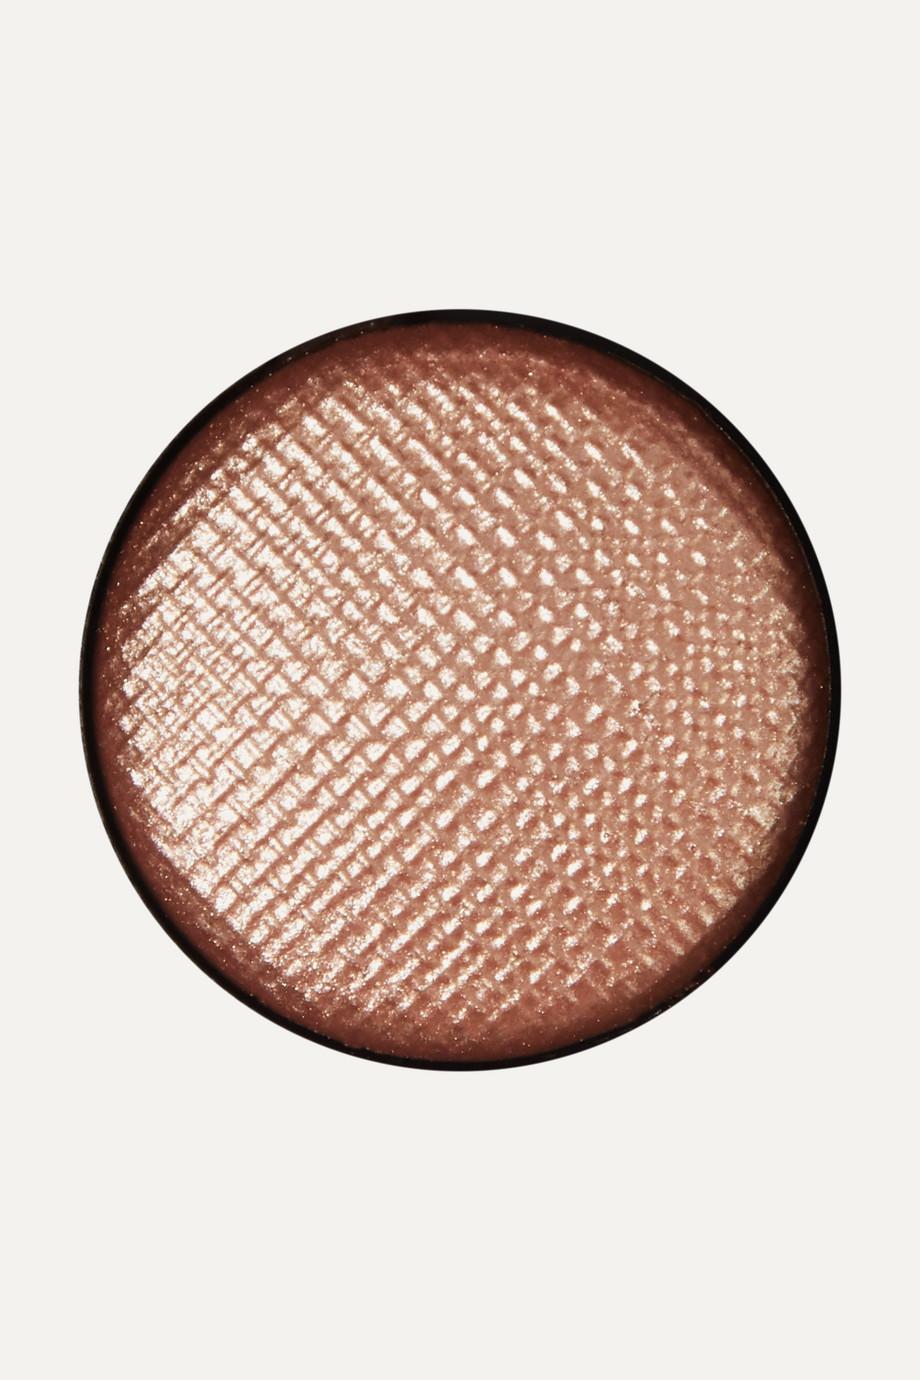 Bobbi Brown Luxe Eye Shadow - Melting Point